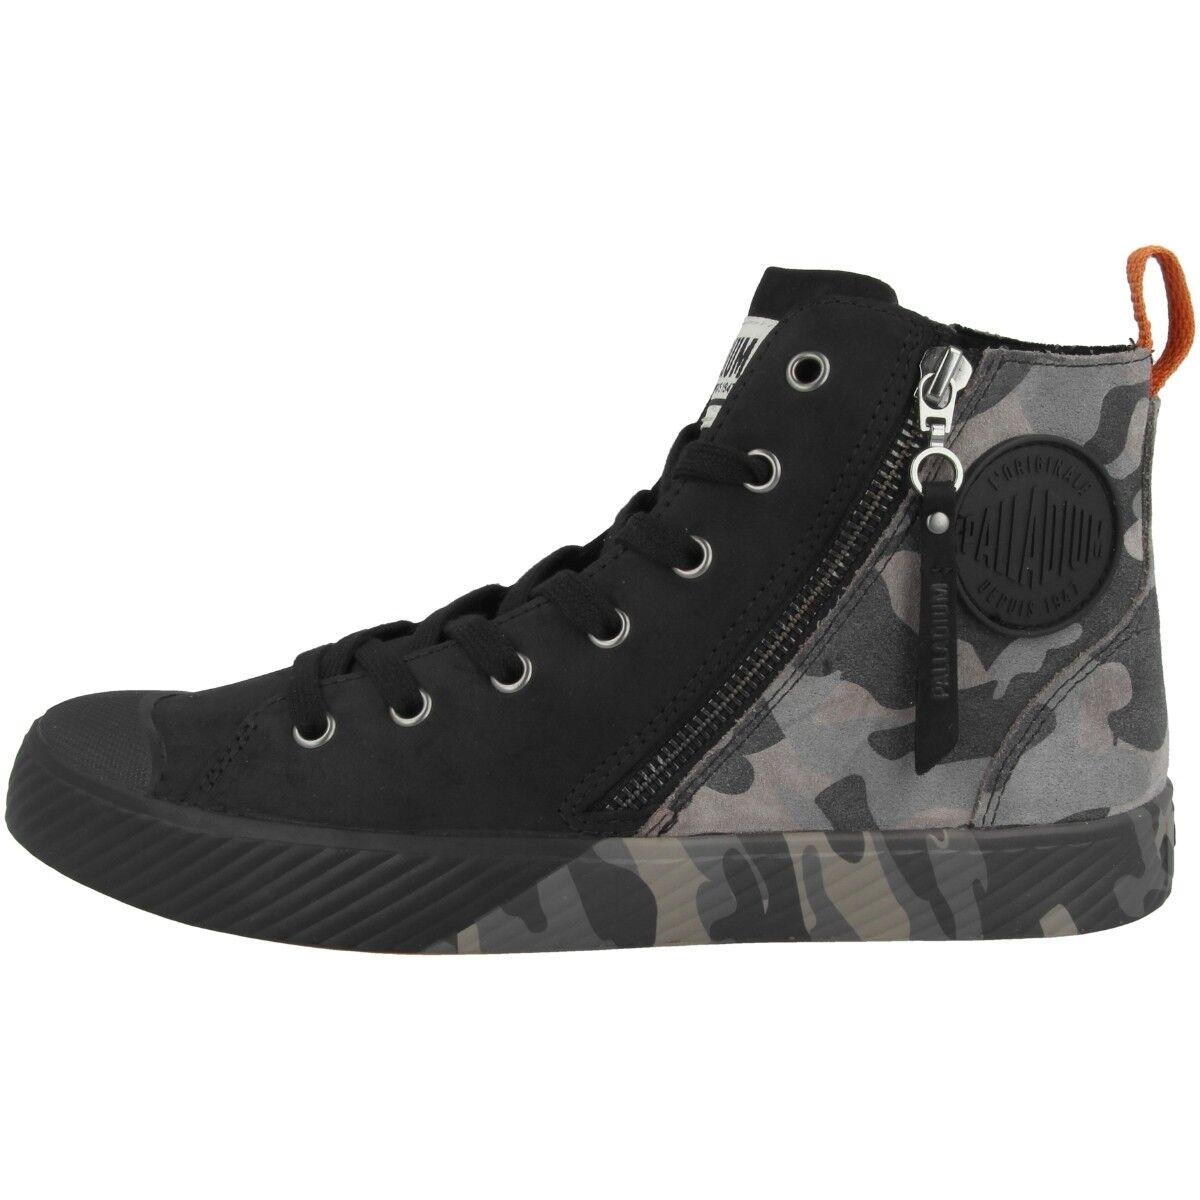 Palladium pallaphoenix Z camo zapatos High Top mujer cortos negro 75949-929